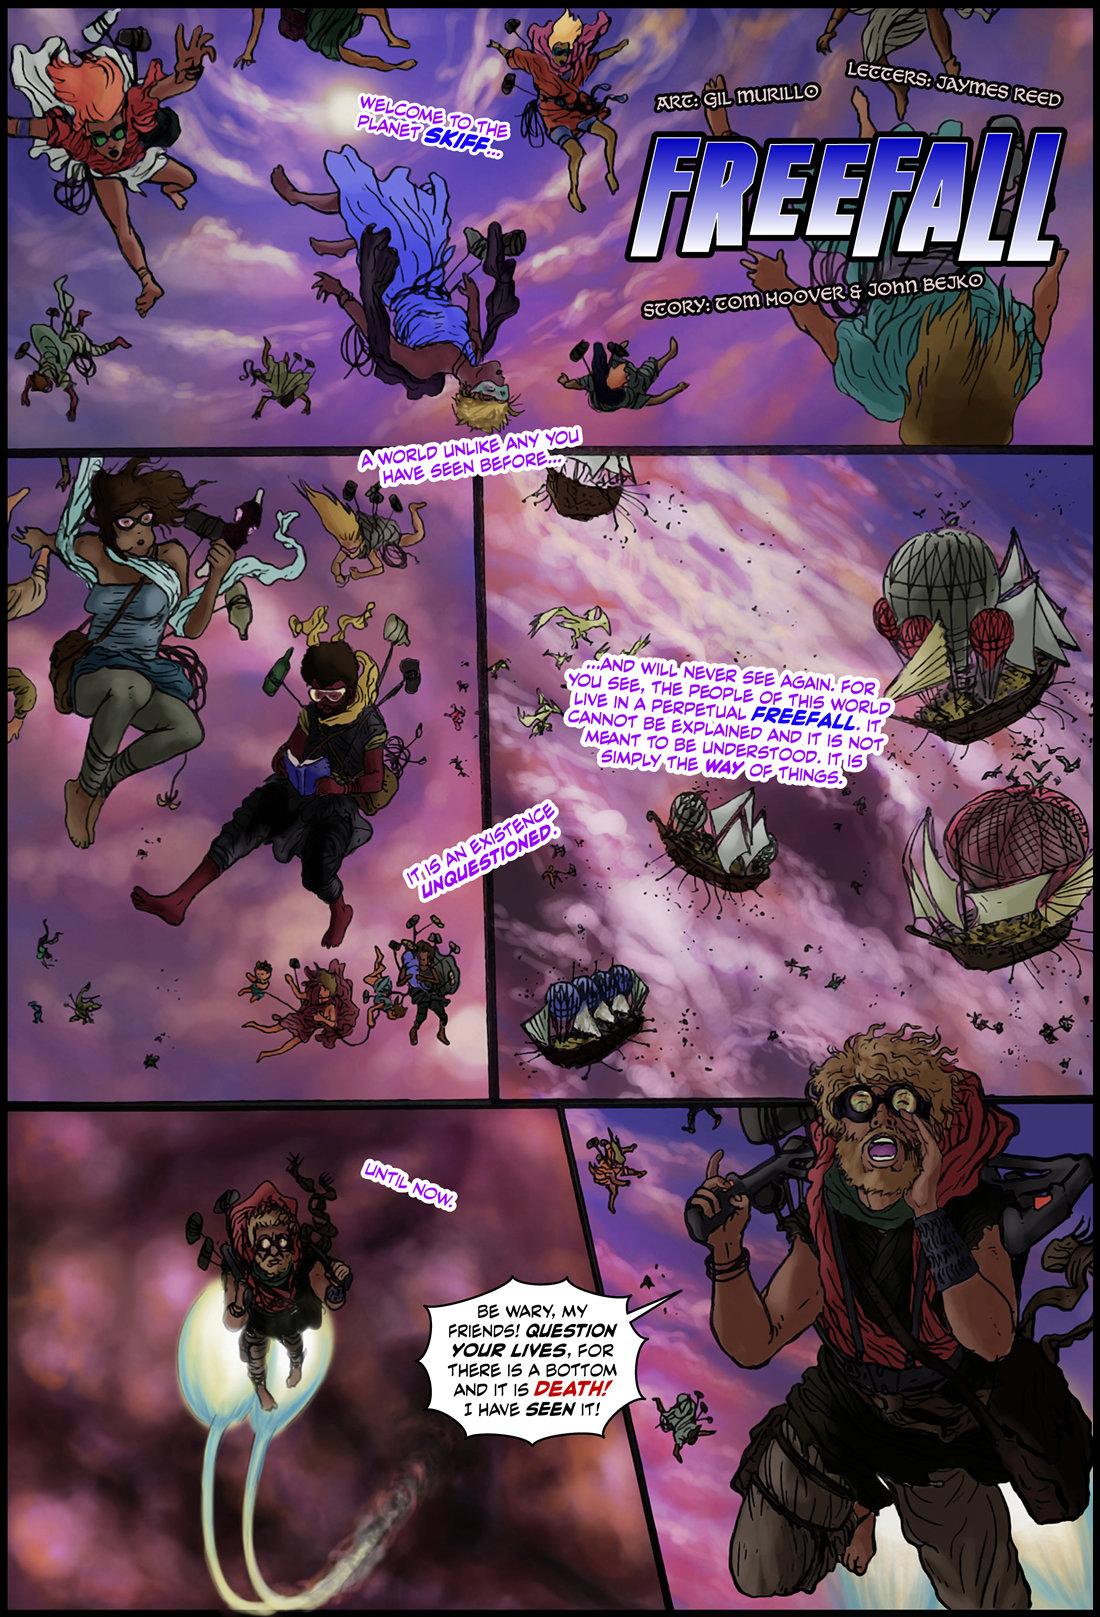 Freefall_Page01.jpg